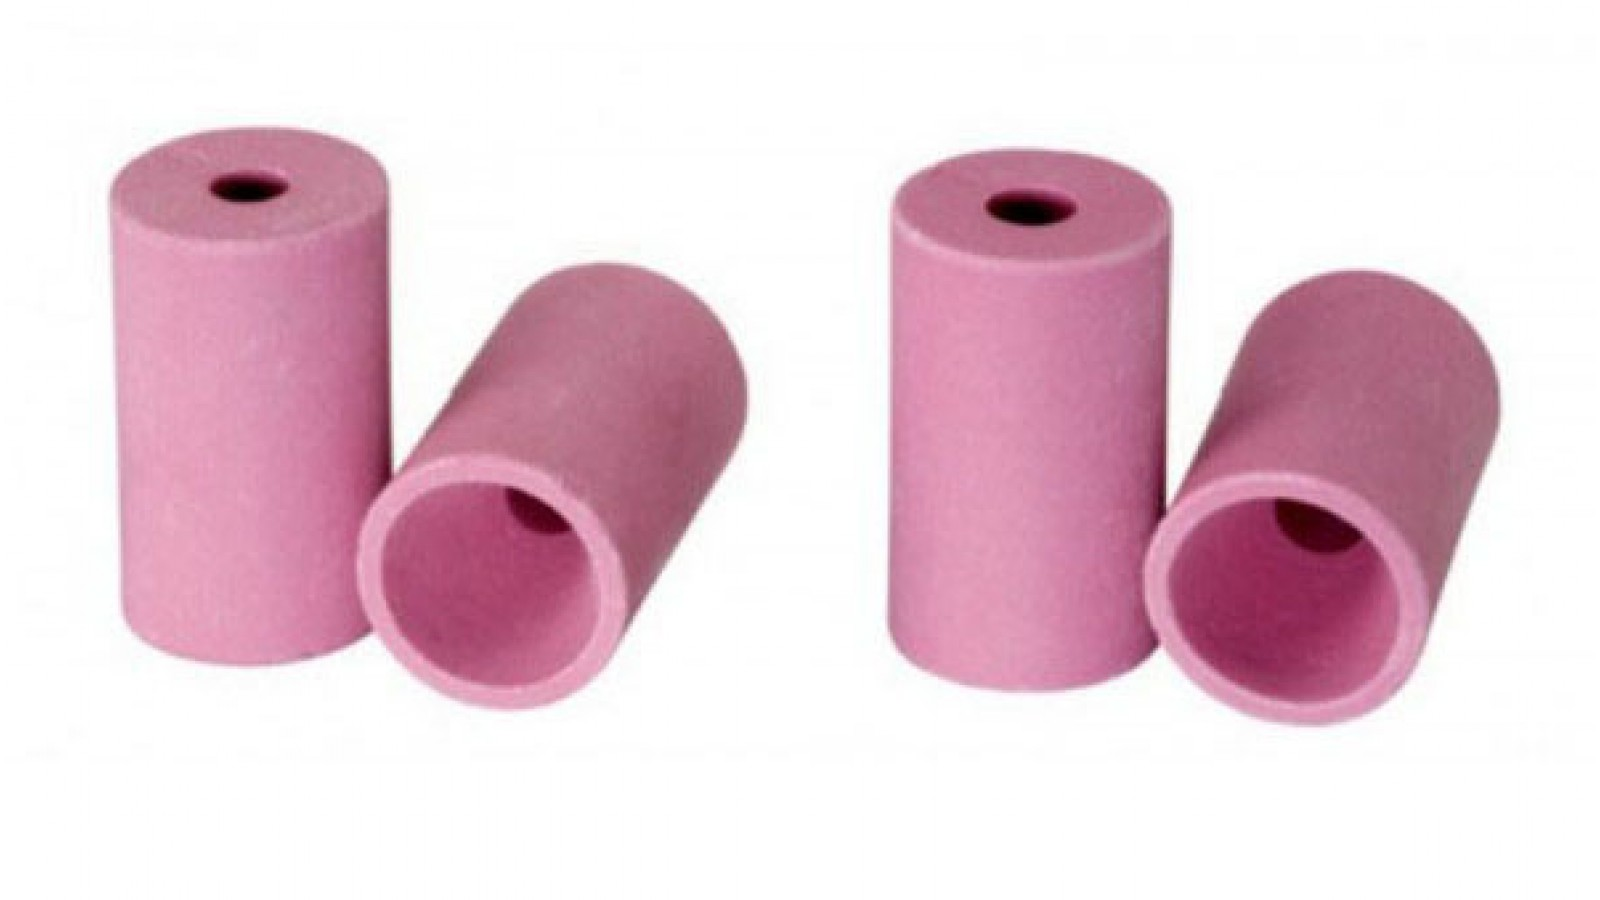 Ugelli MAX in ceramica per sabbiatrice professionale, diametro foro ø 7 mm 4 pz.